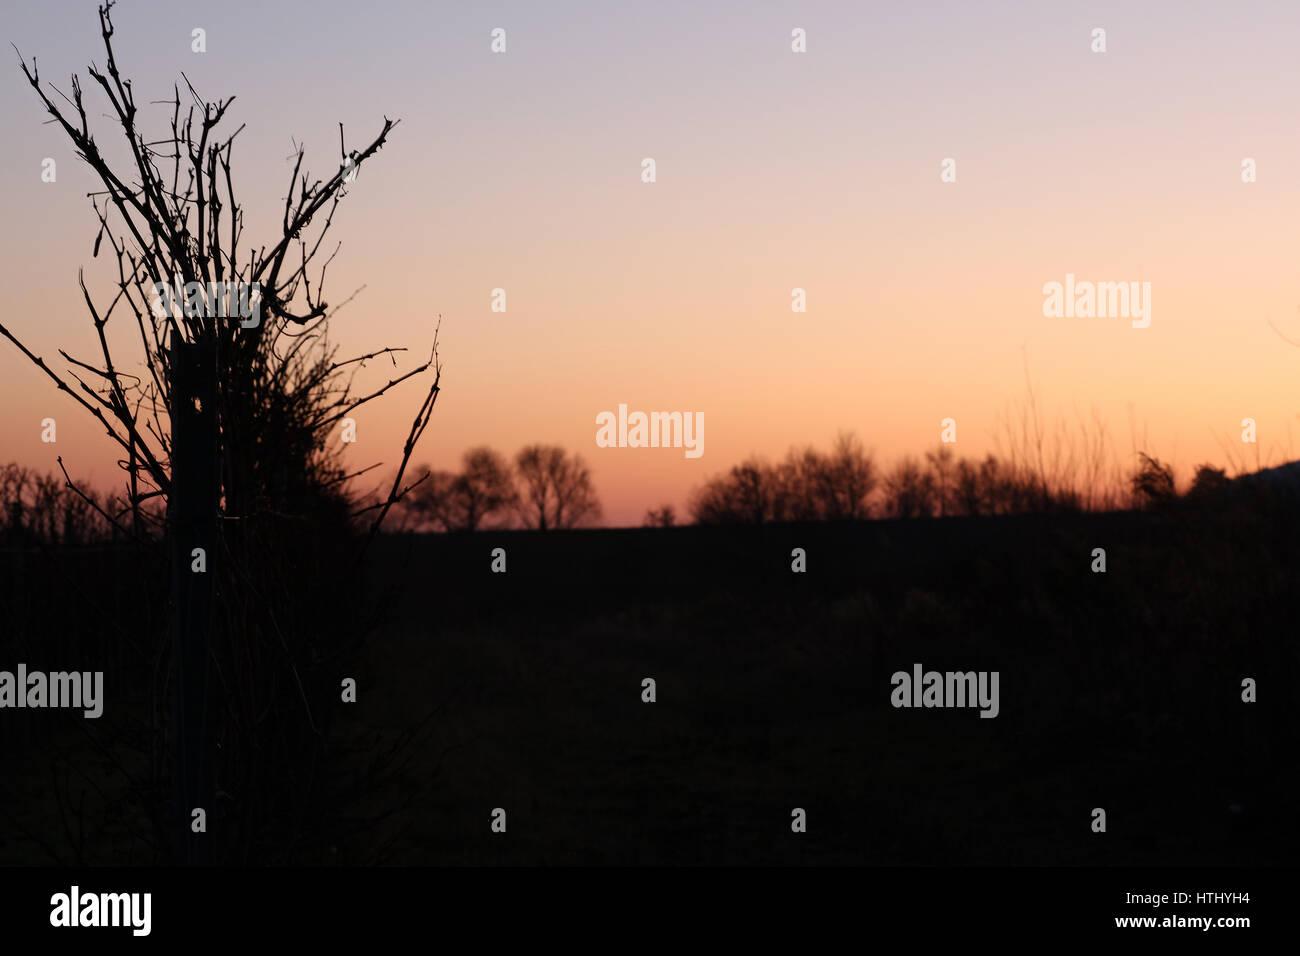 Weinberg im Sonnenuntergang Stock Photo